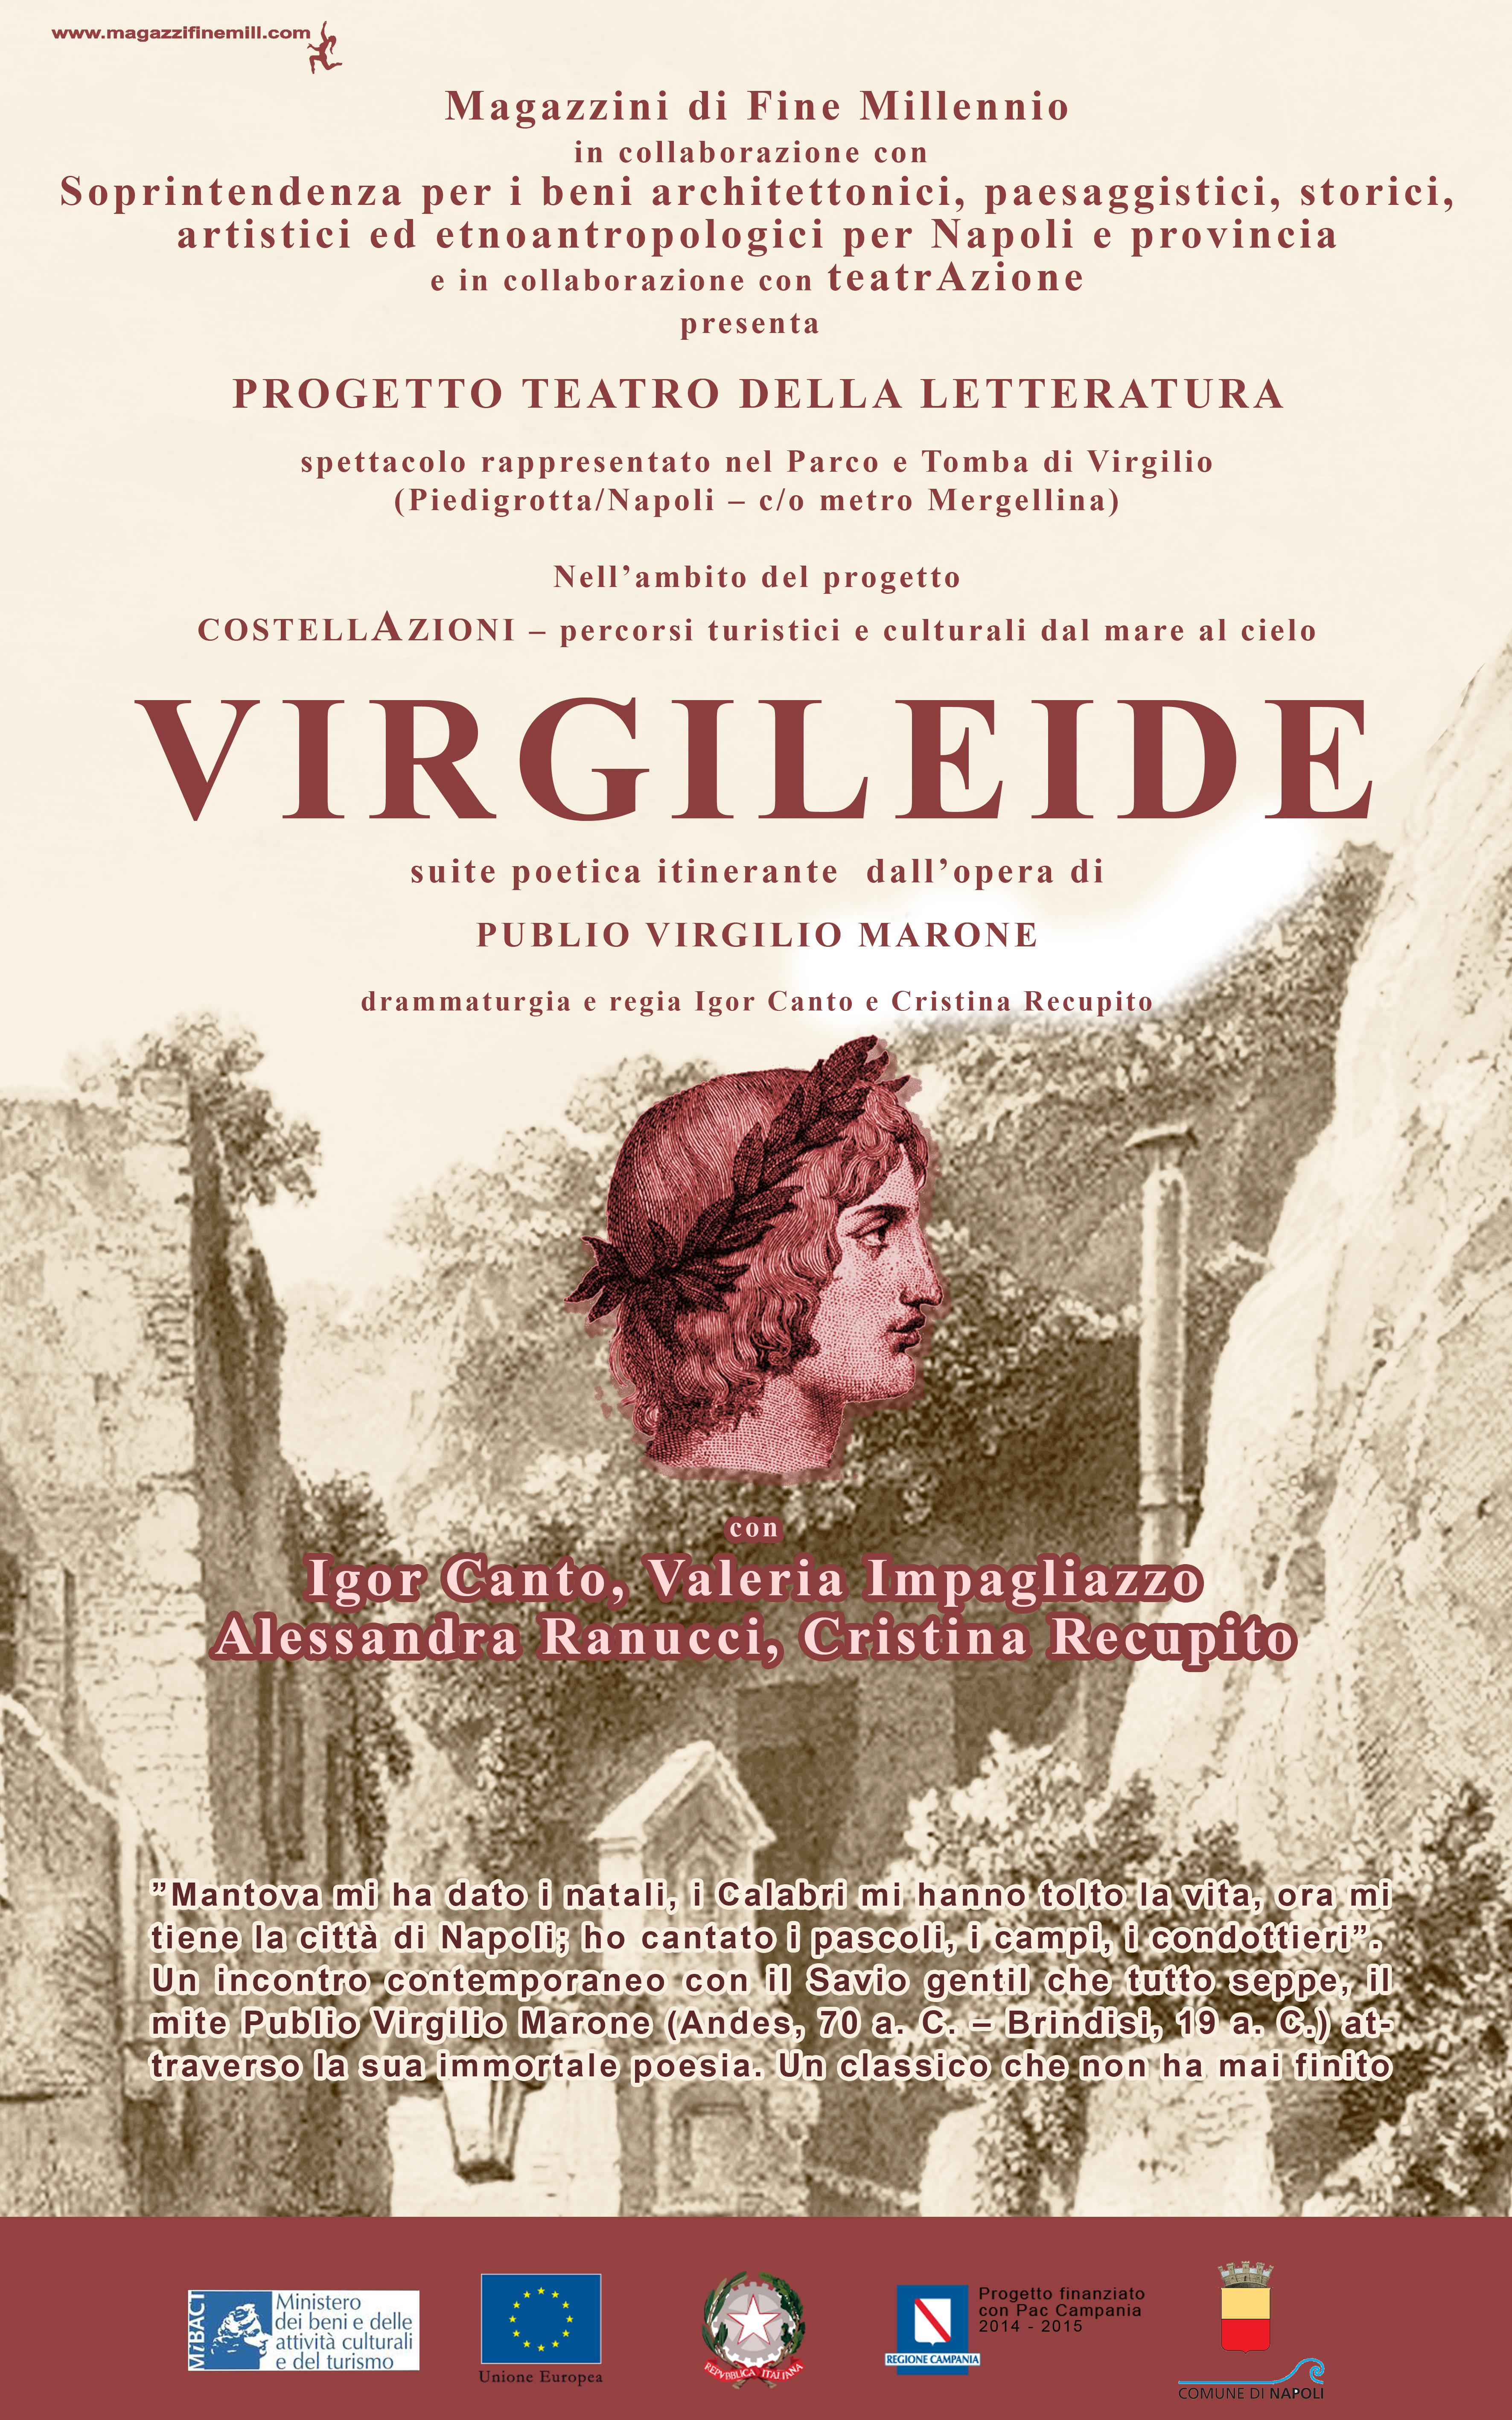 VIRGILEIDE